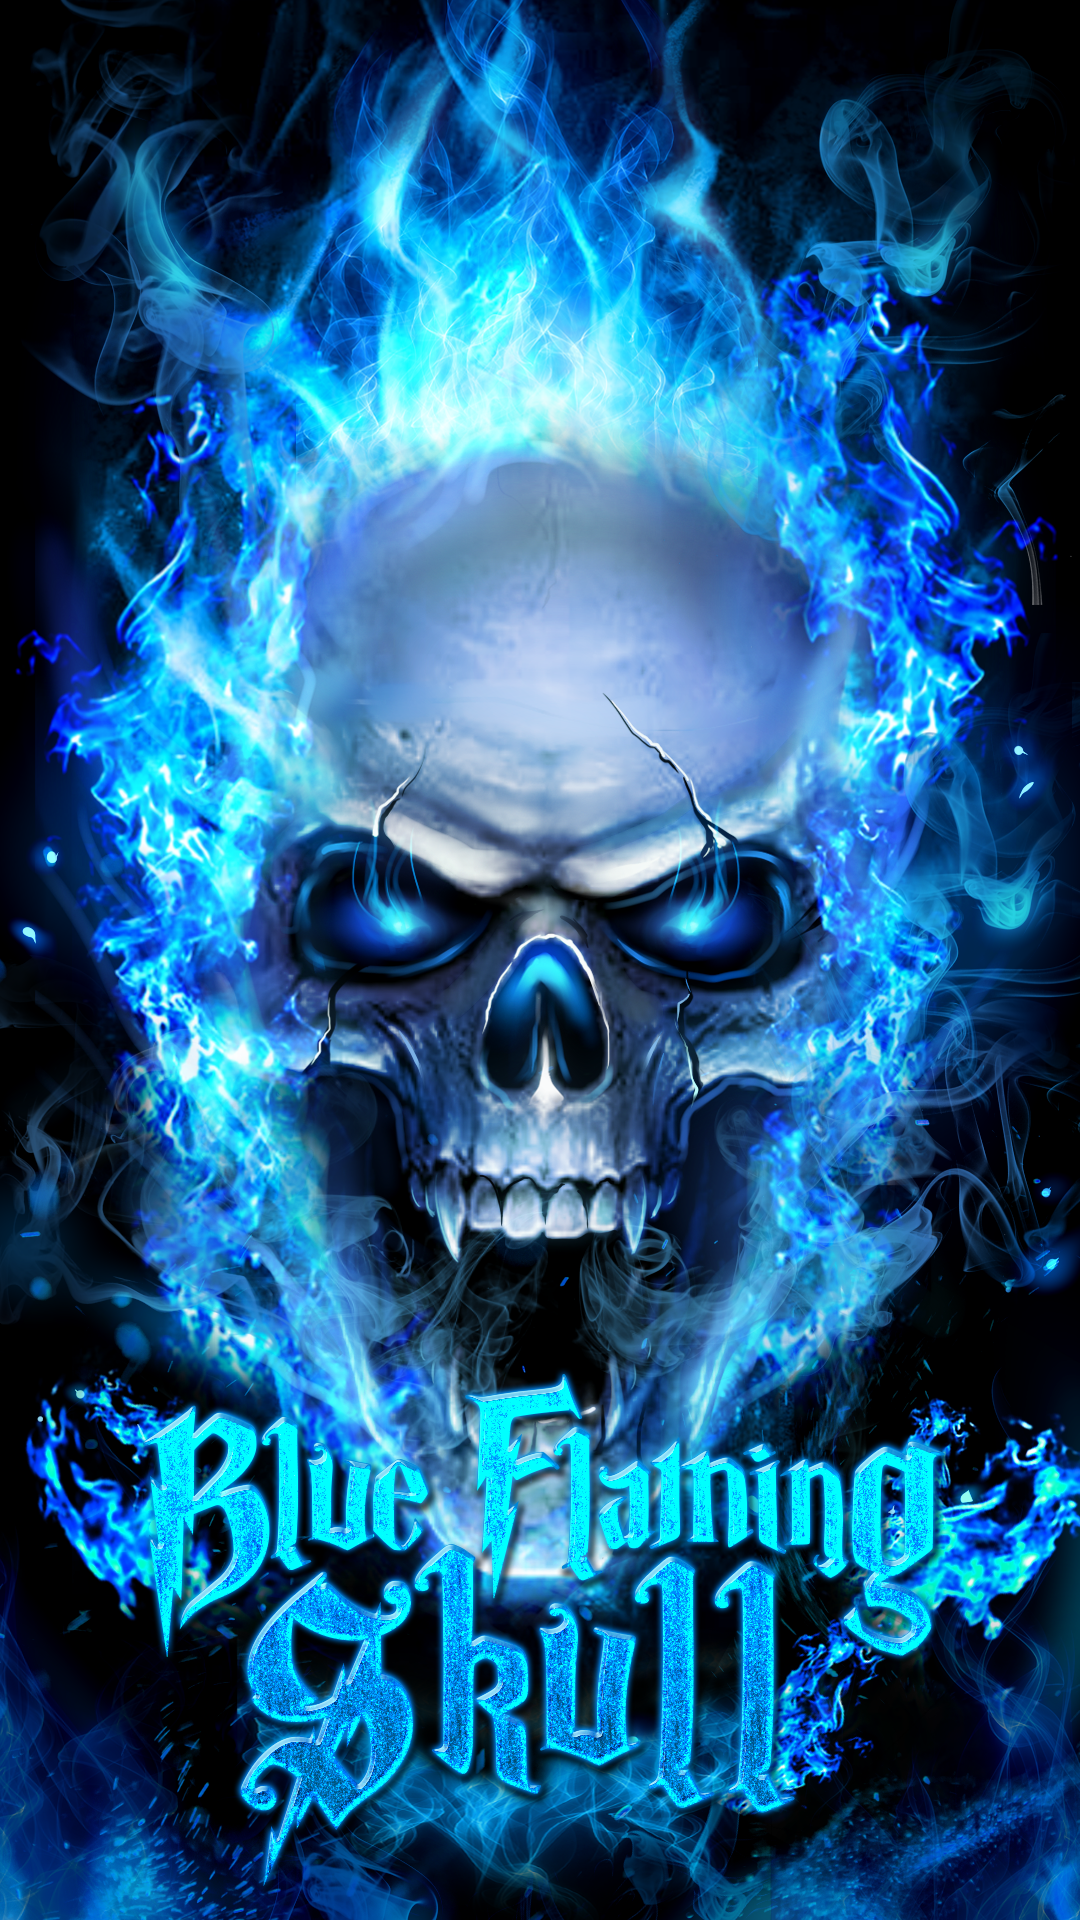 Blue Flaming Skull Live Wallpaper Skull Wallpaper Skull Pictures Skull